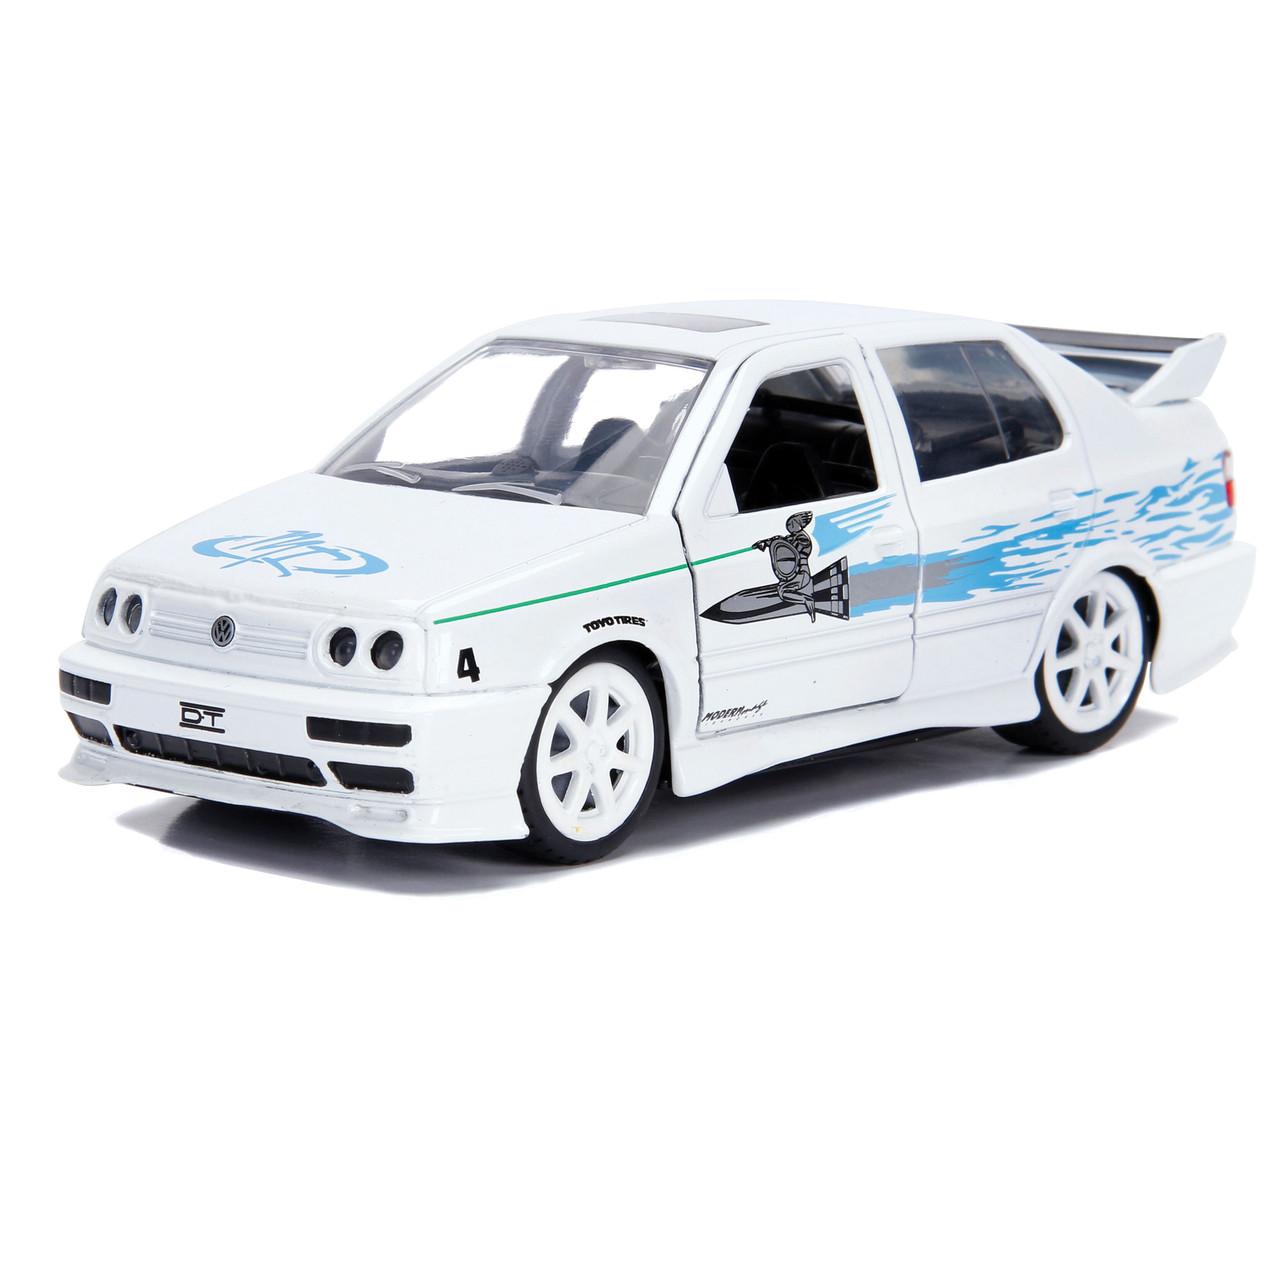 Fast & Furious VW Jetta 1:32 Scale Diecast Model By Jada